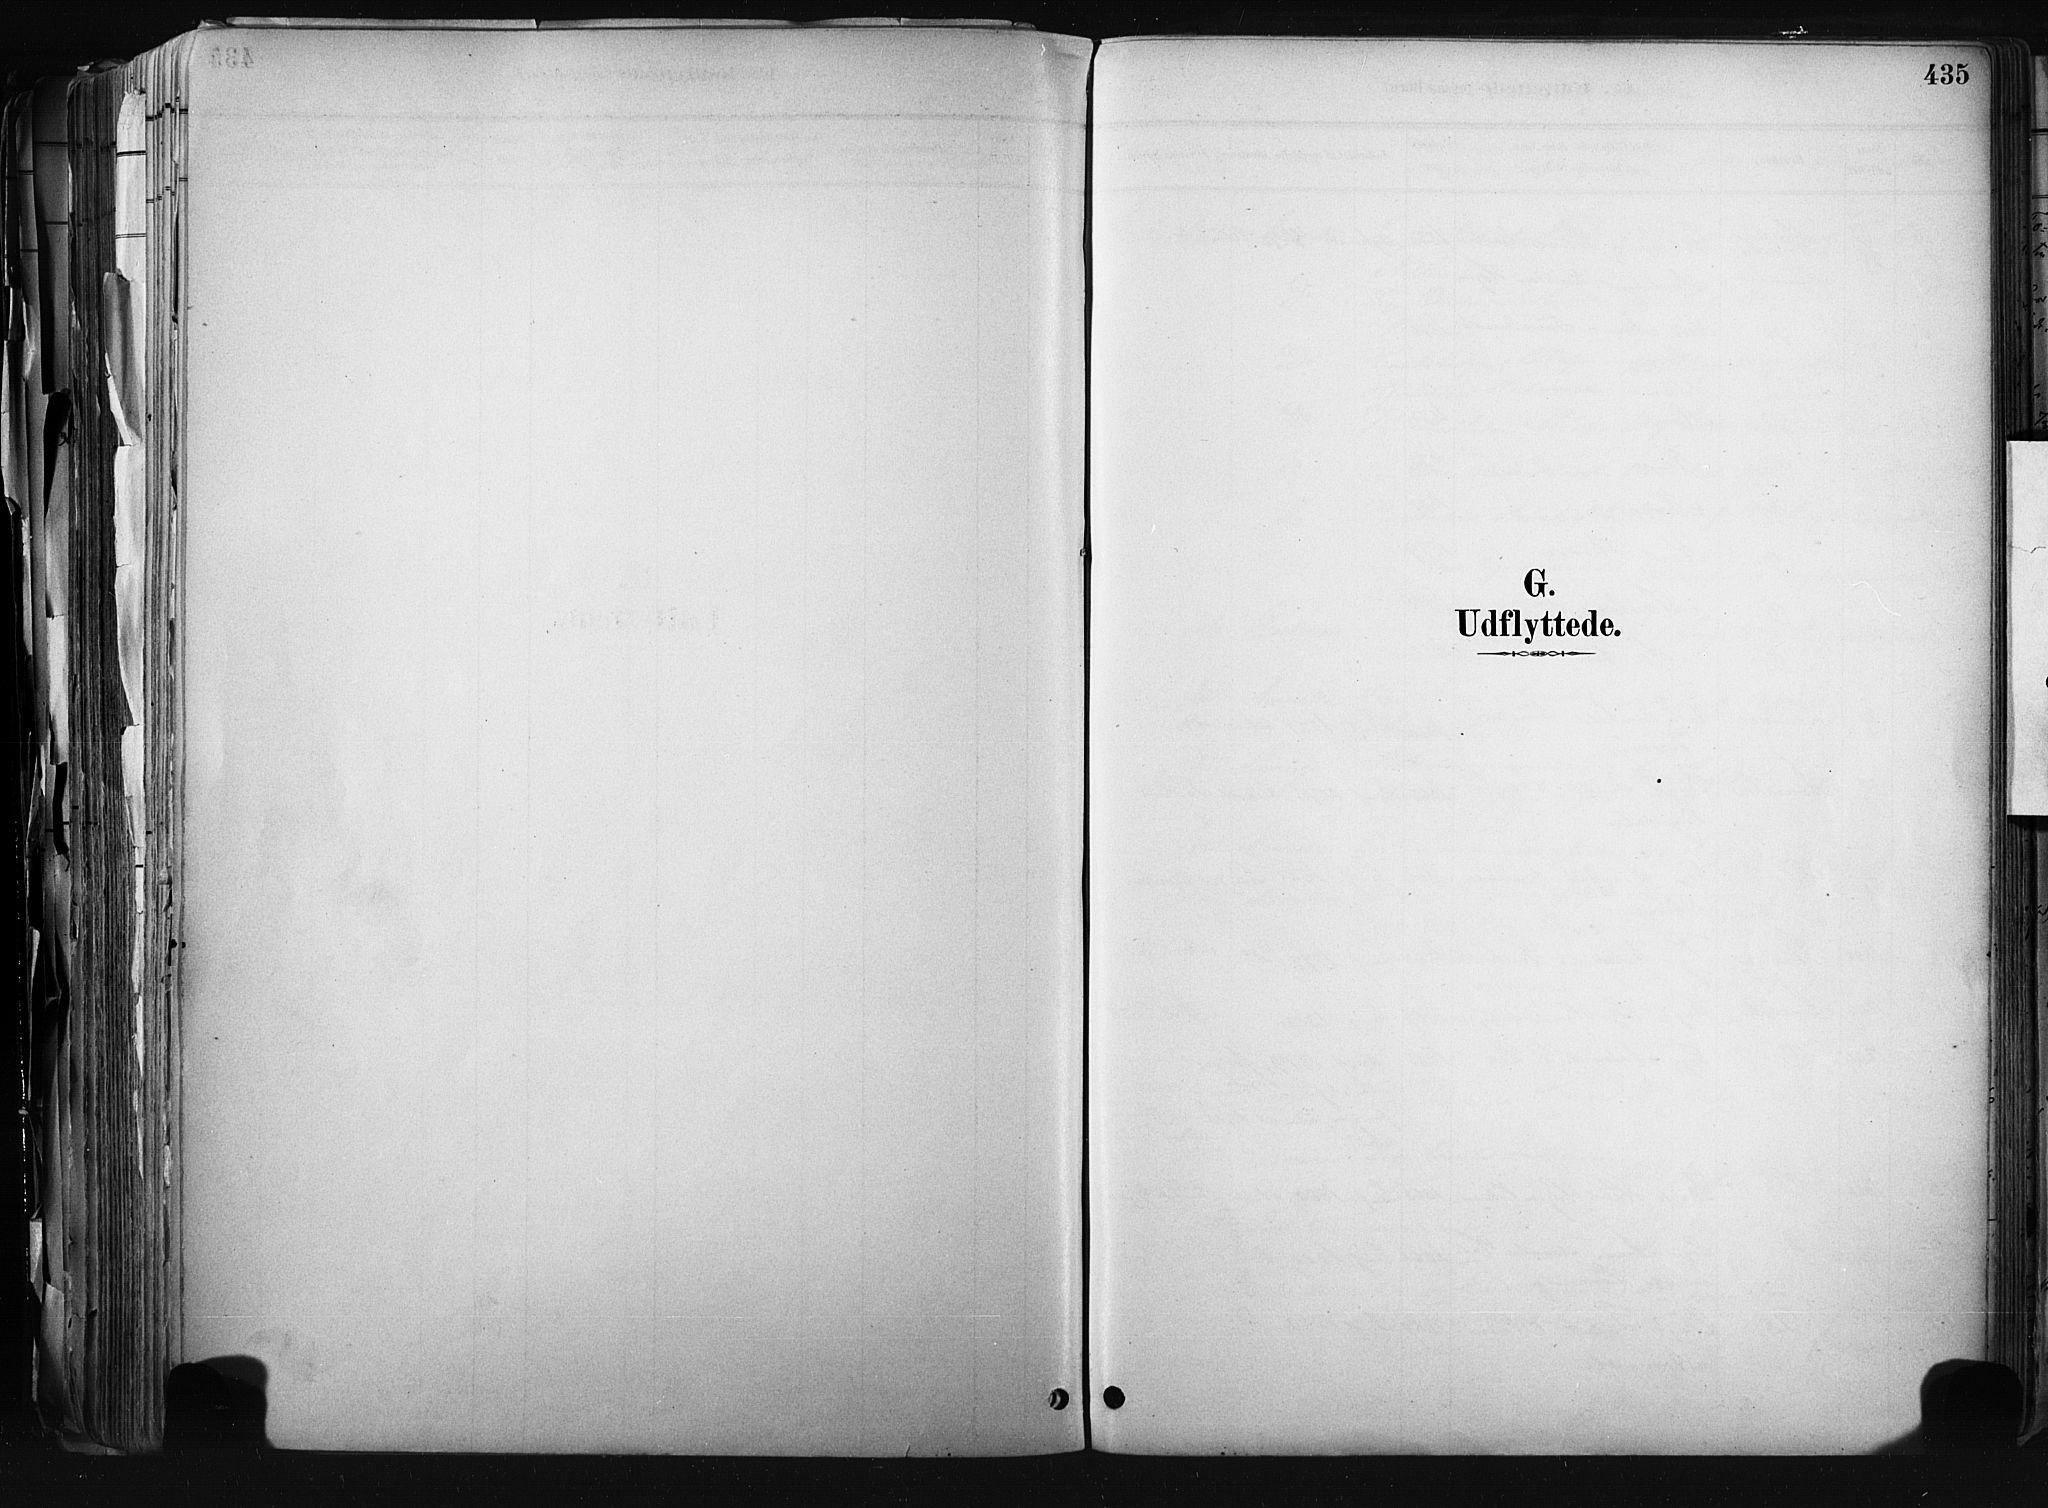 SAKO, Kongsberg kirkebøker, F/Fb/L0002: Ministerialbok nr. II 2, 1886-1896, s. 435